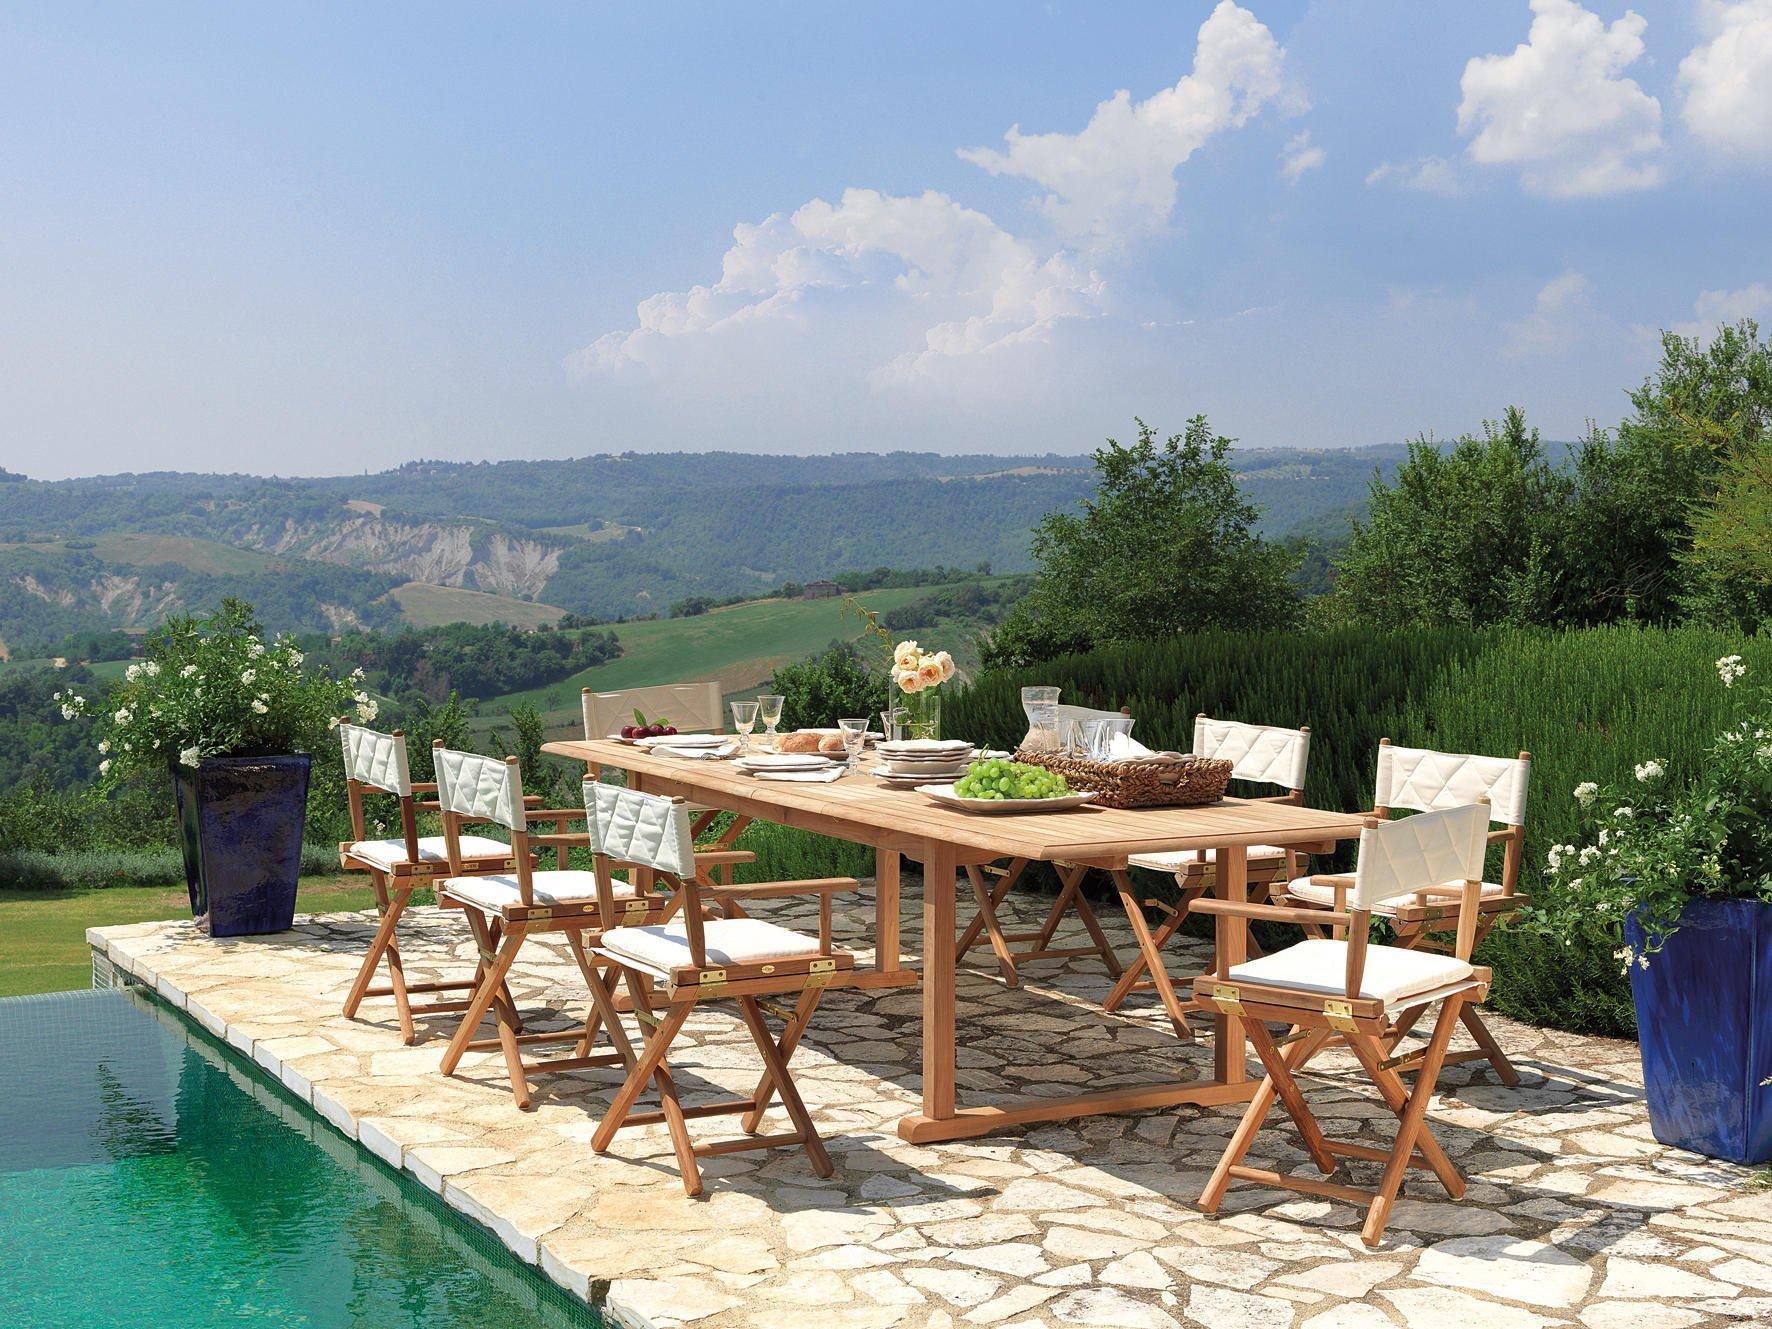 Tavolo giardino MILTON a Salerno da Montella Prisma Arredo